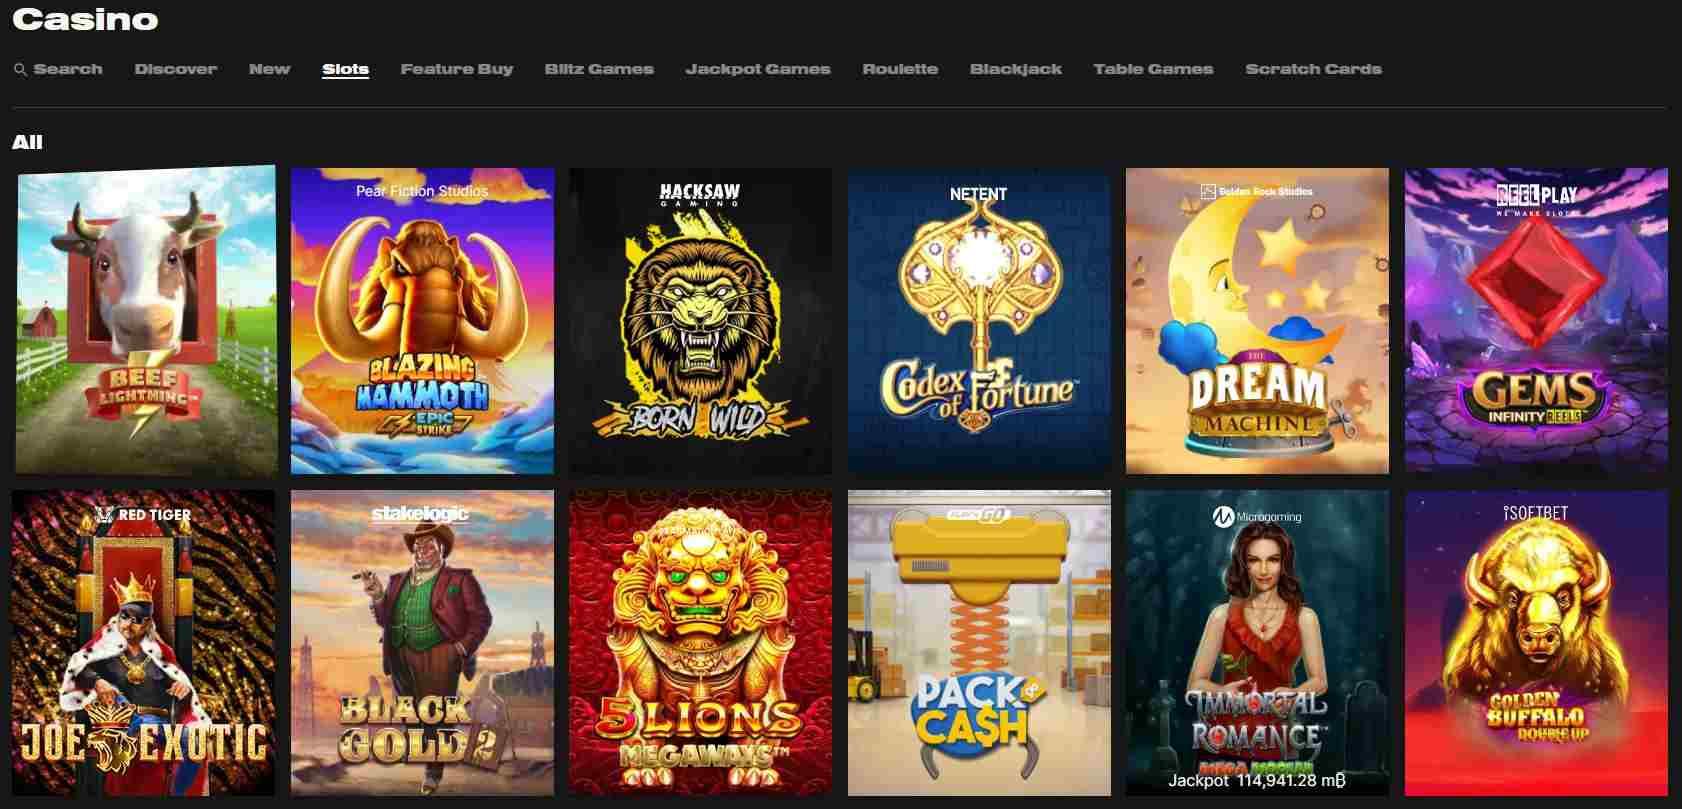 No Limits Casino games selection showing slot